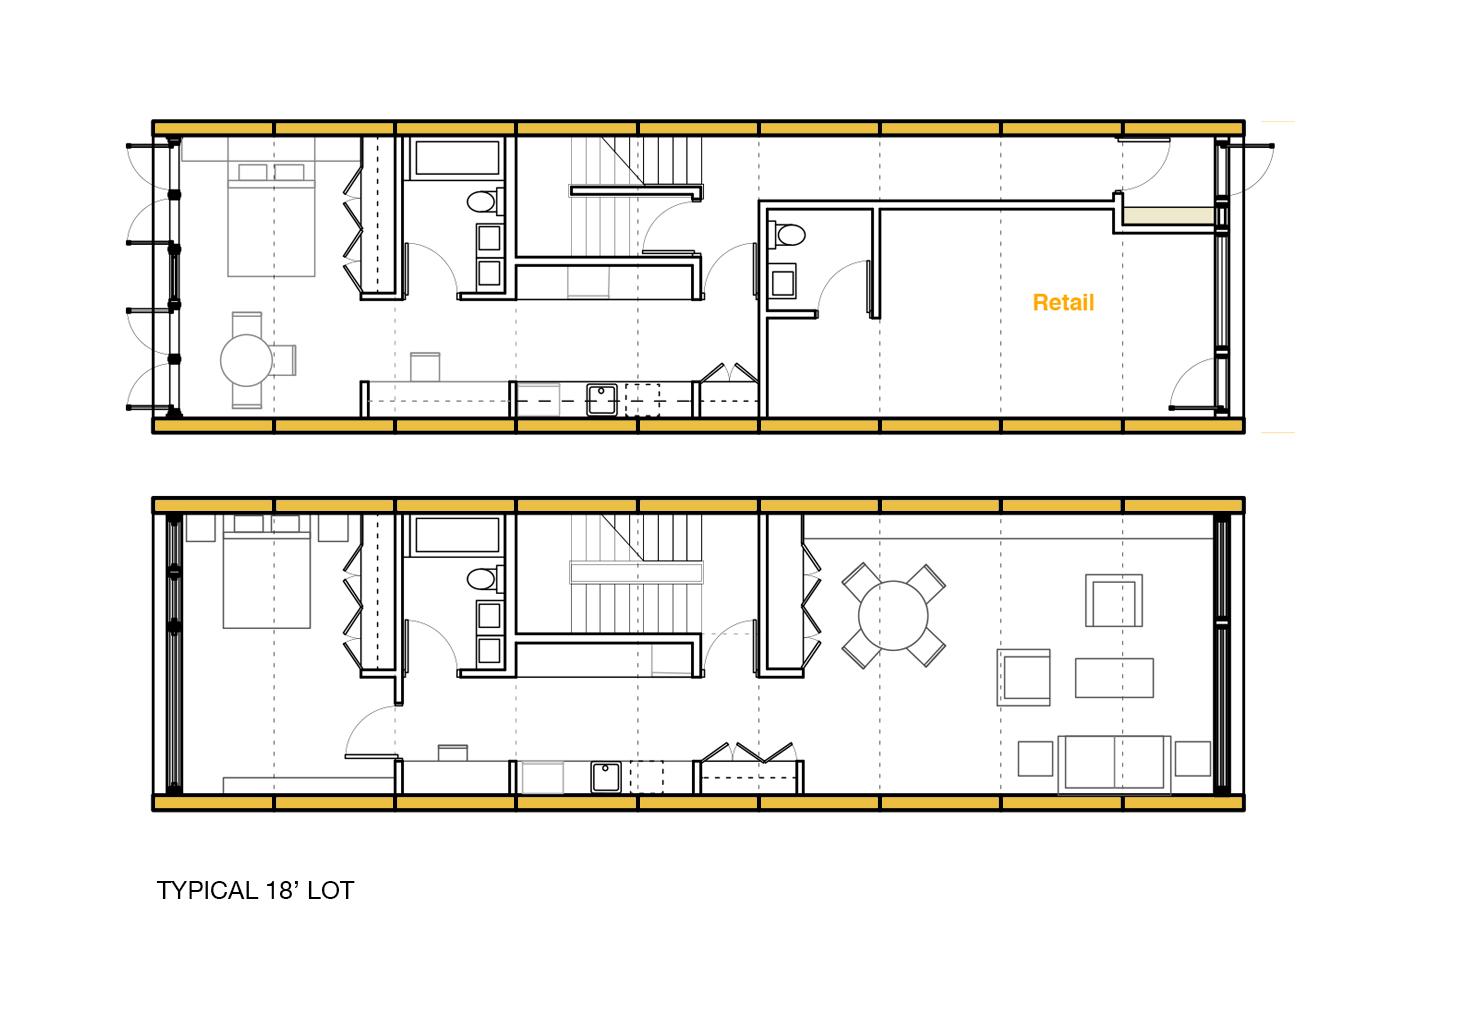 Townhouse Plan 1.jpg